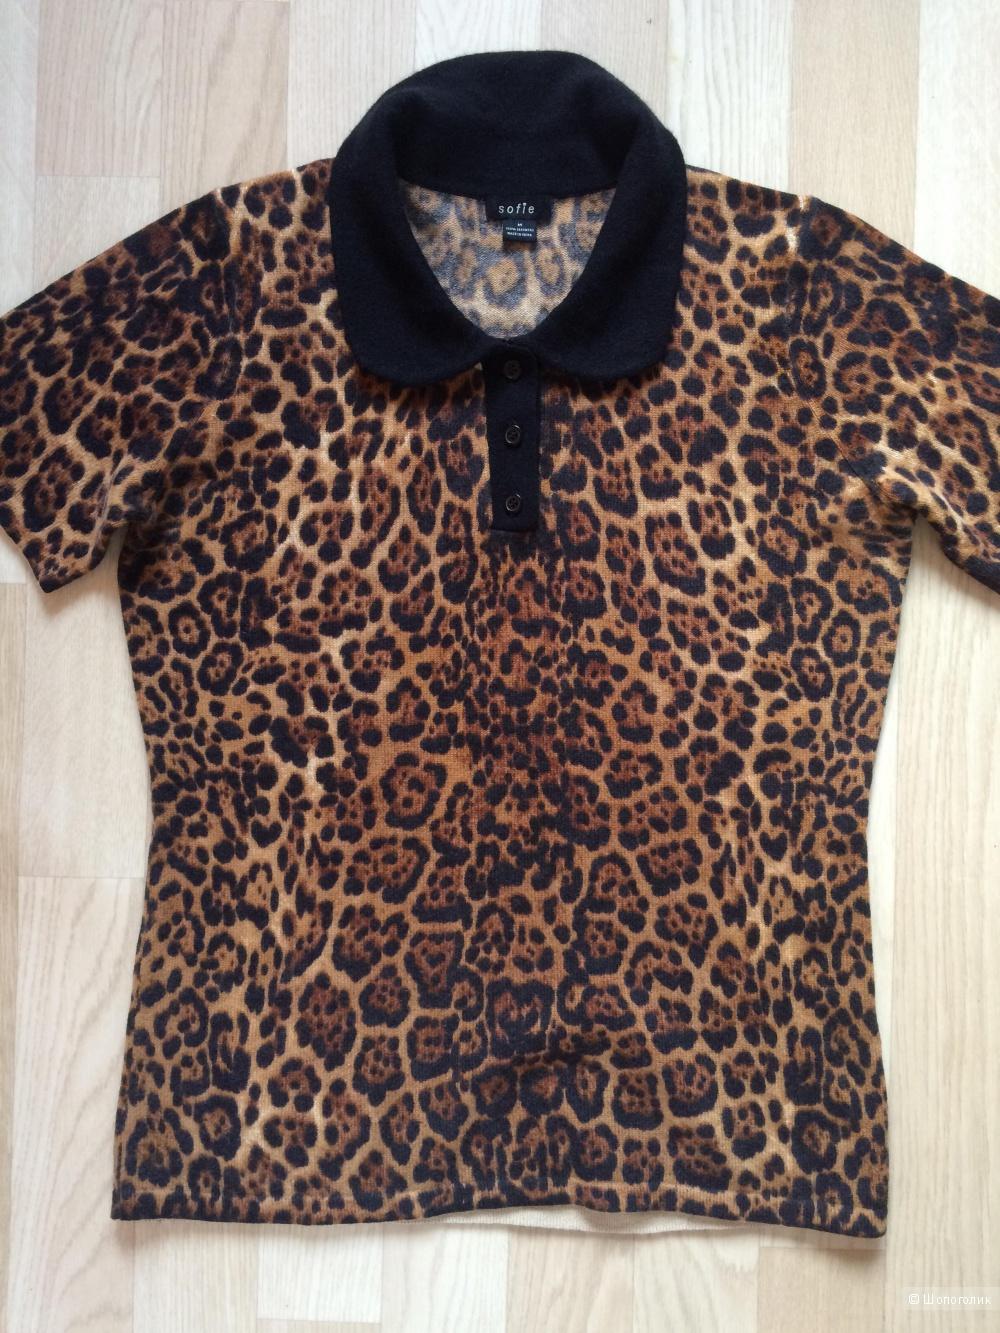 Шикарная леопардовая кофточка Sofie 100% Cachemire